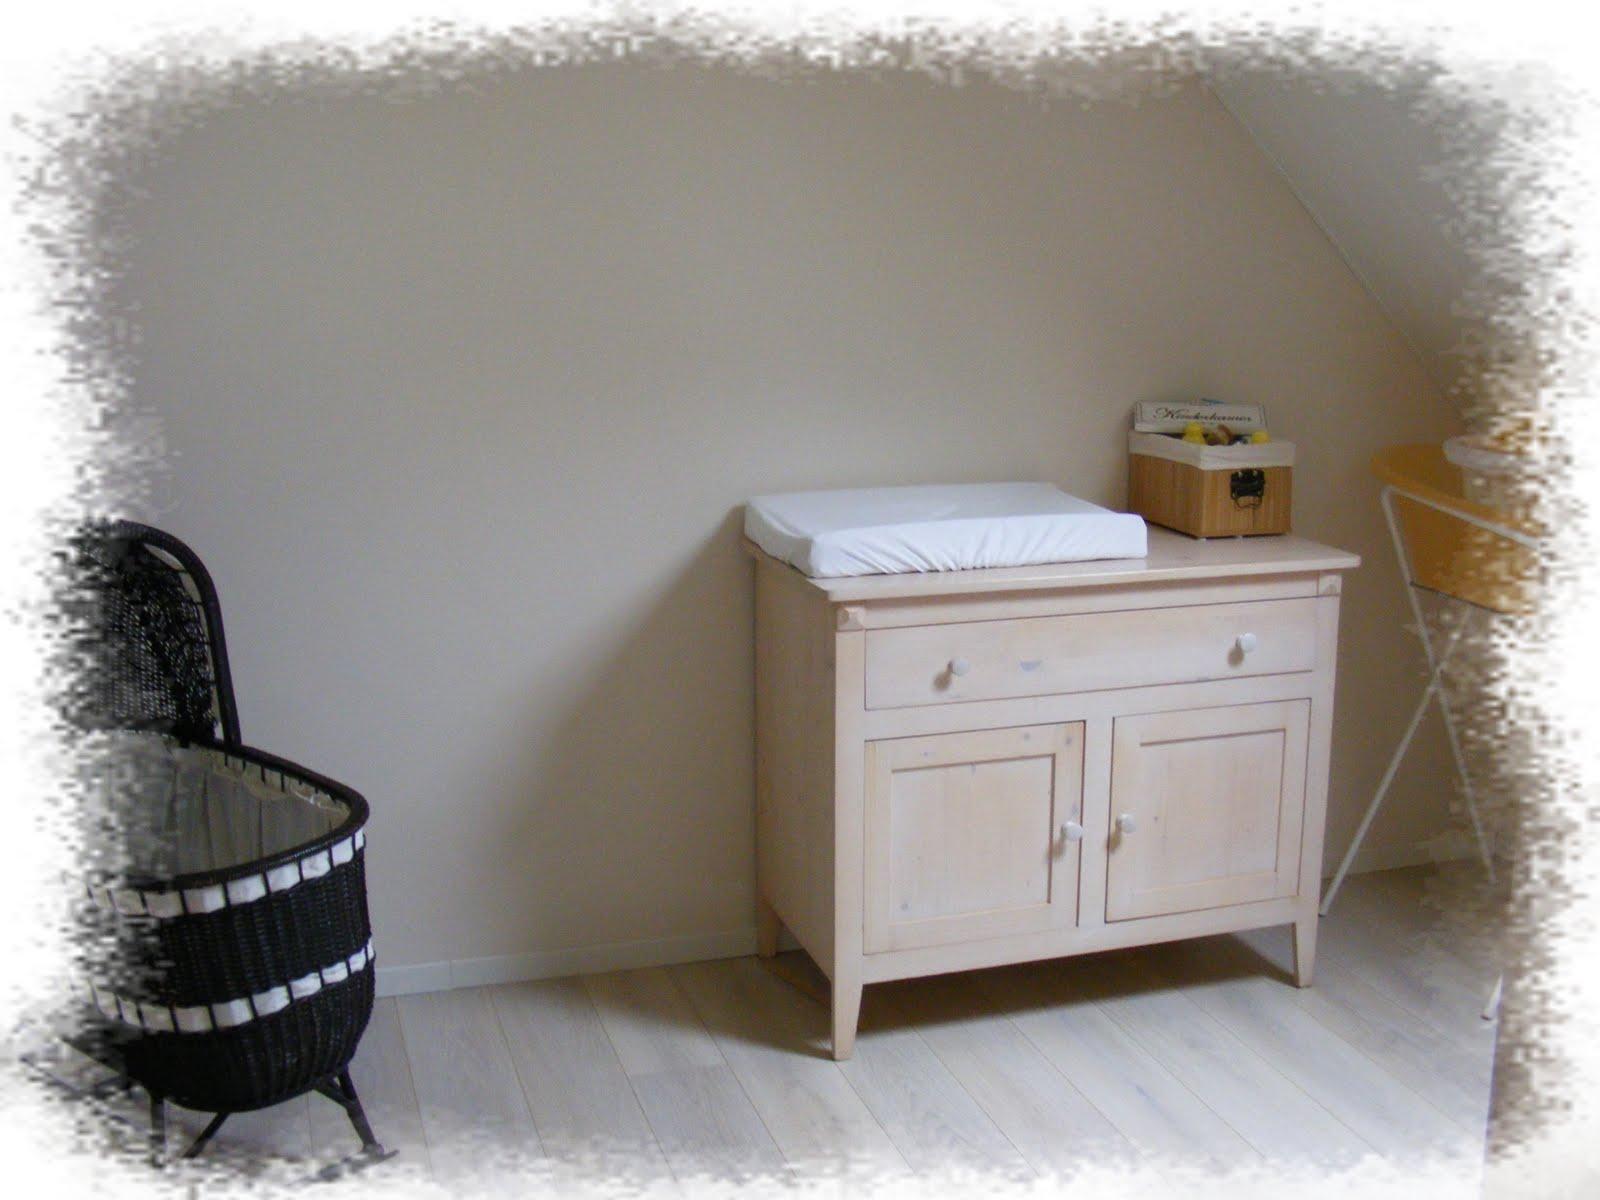 Babykamer In Nisje : Sandra s scrapkaarten freubels de babykamer en kamertje van